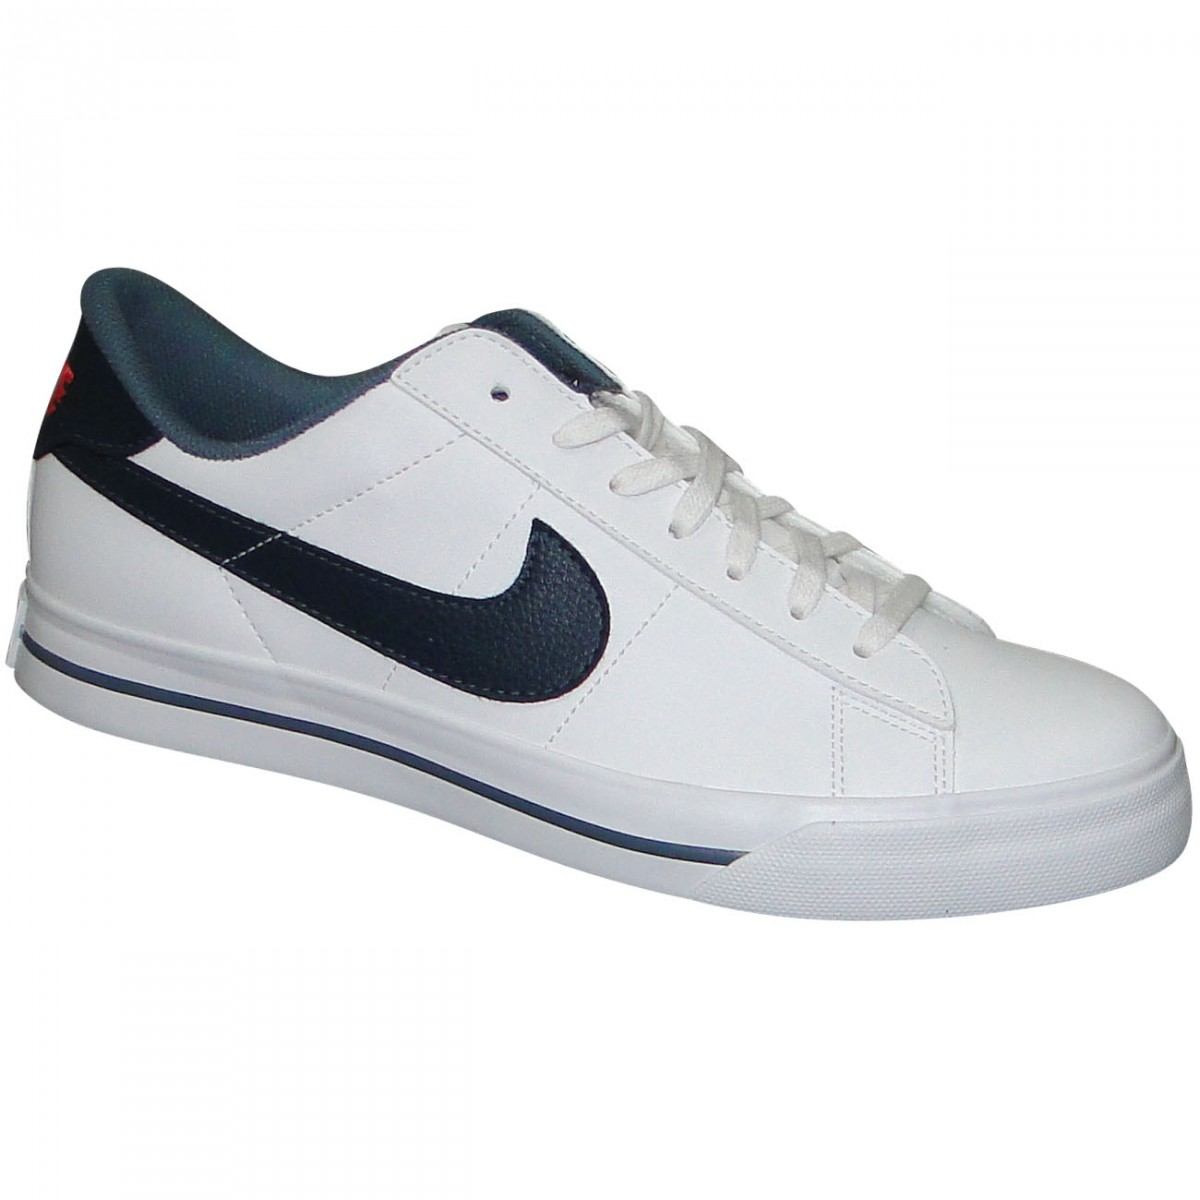 995040016f0 Tenis Nike Sweet Classic Low Sl 580442 101 - Branco Marinho ...